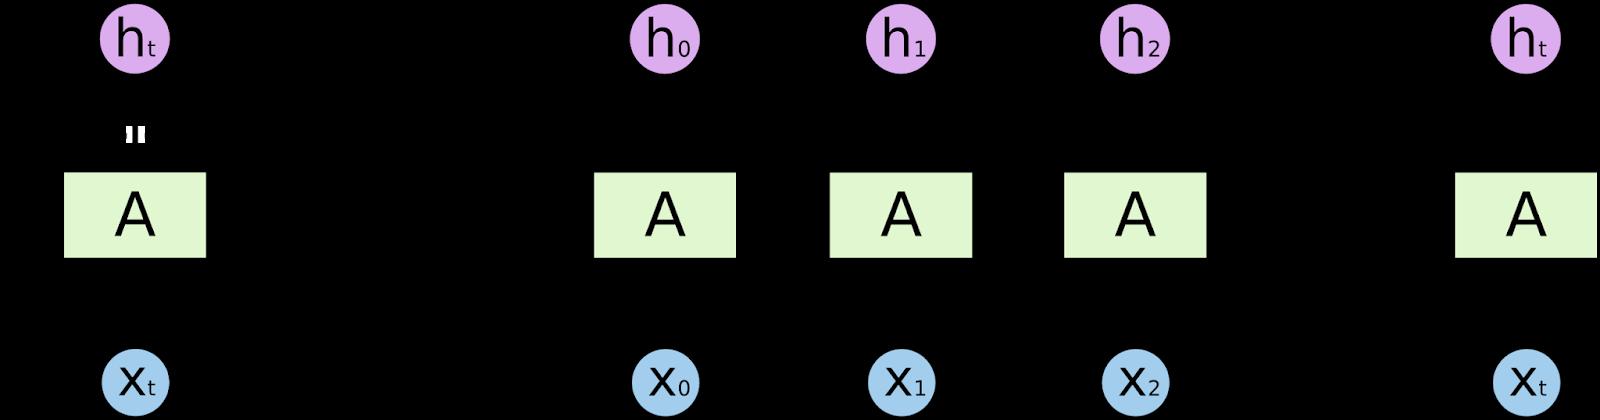 Recurrent Neural Networks.